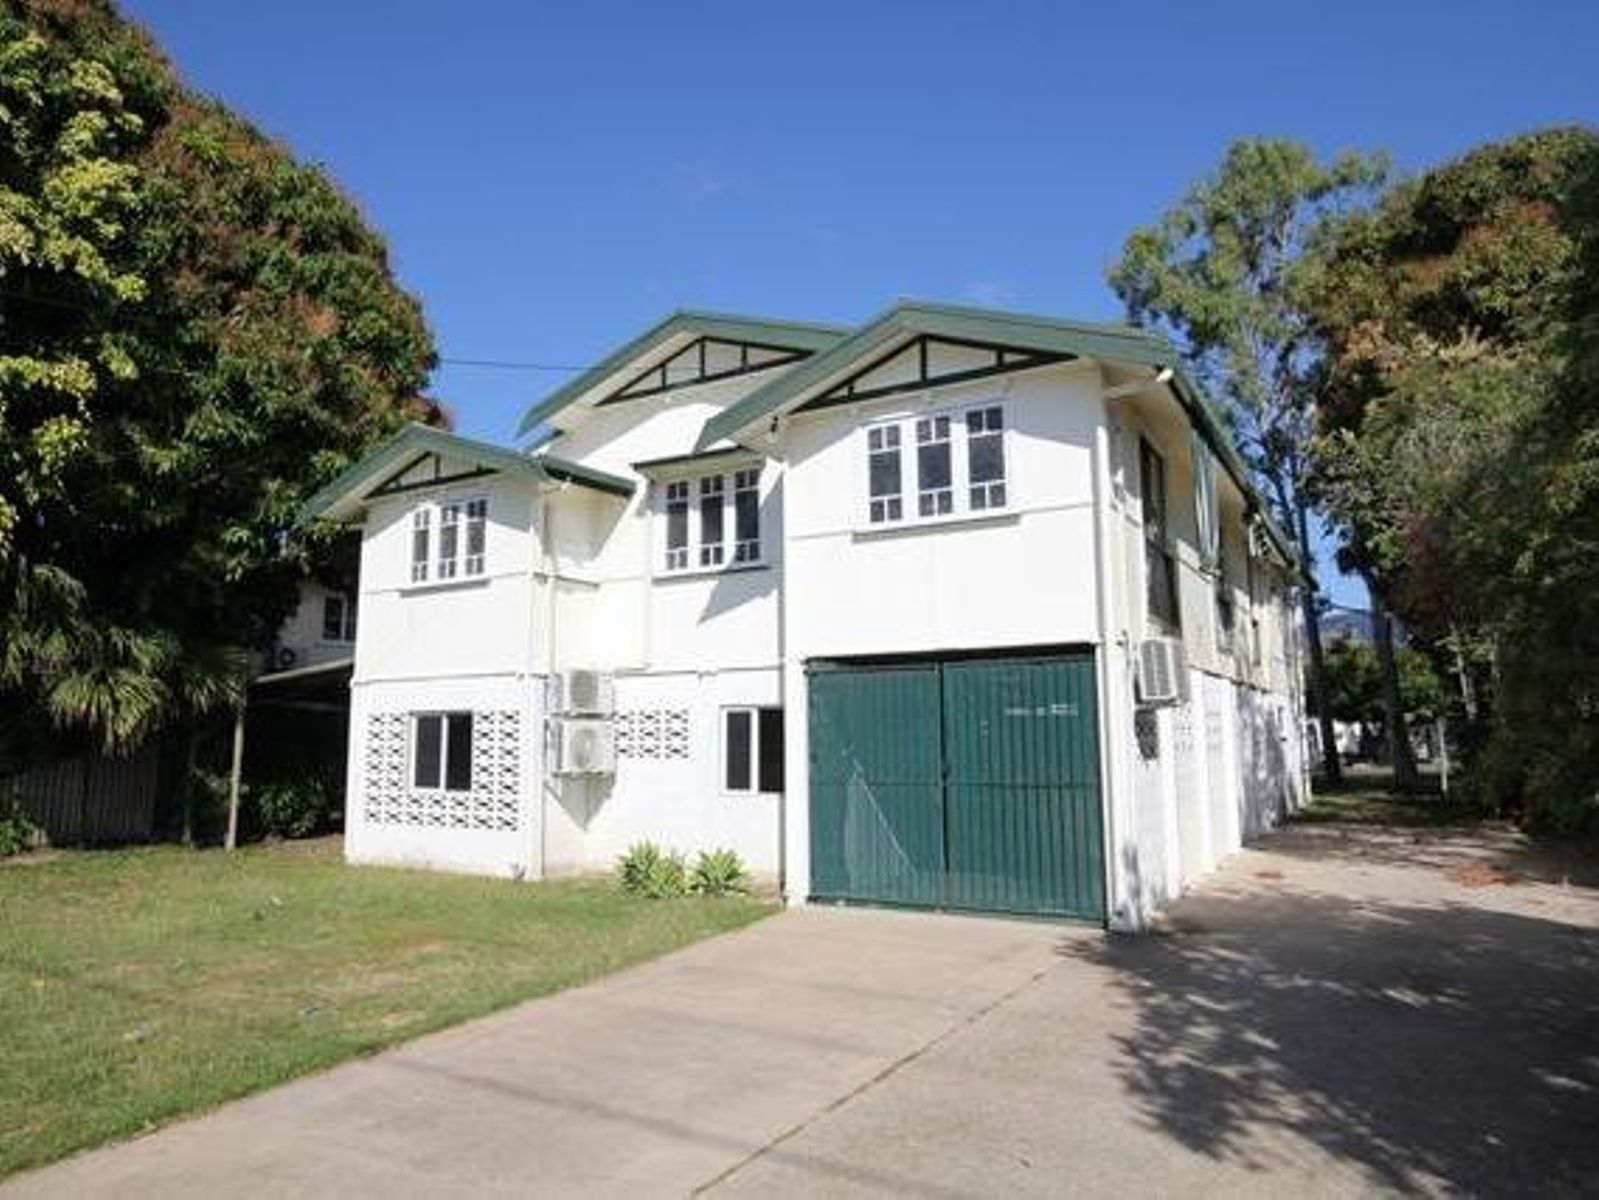 14 Patrick Street, Aitkenvale, QLD 4814